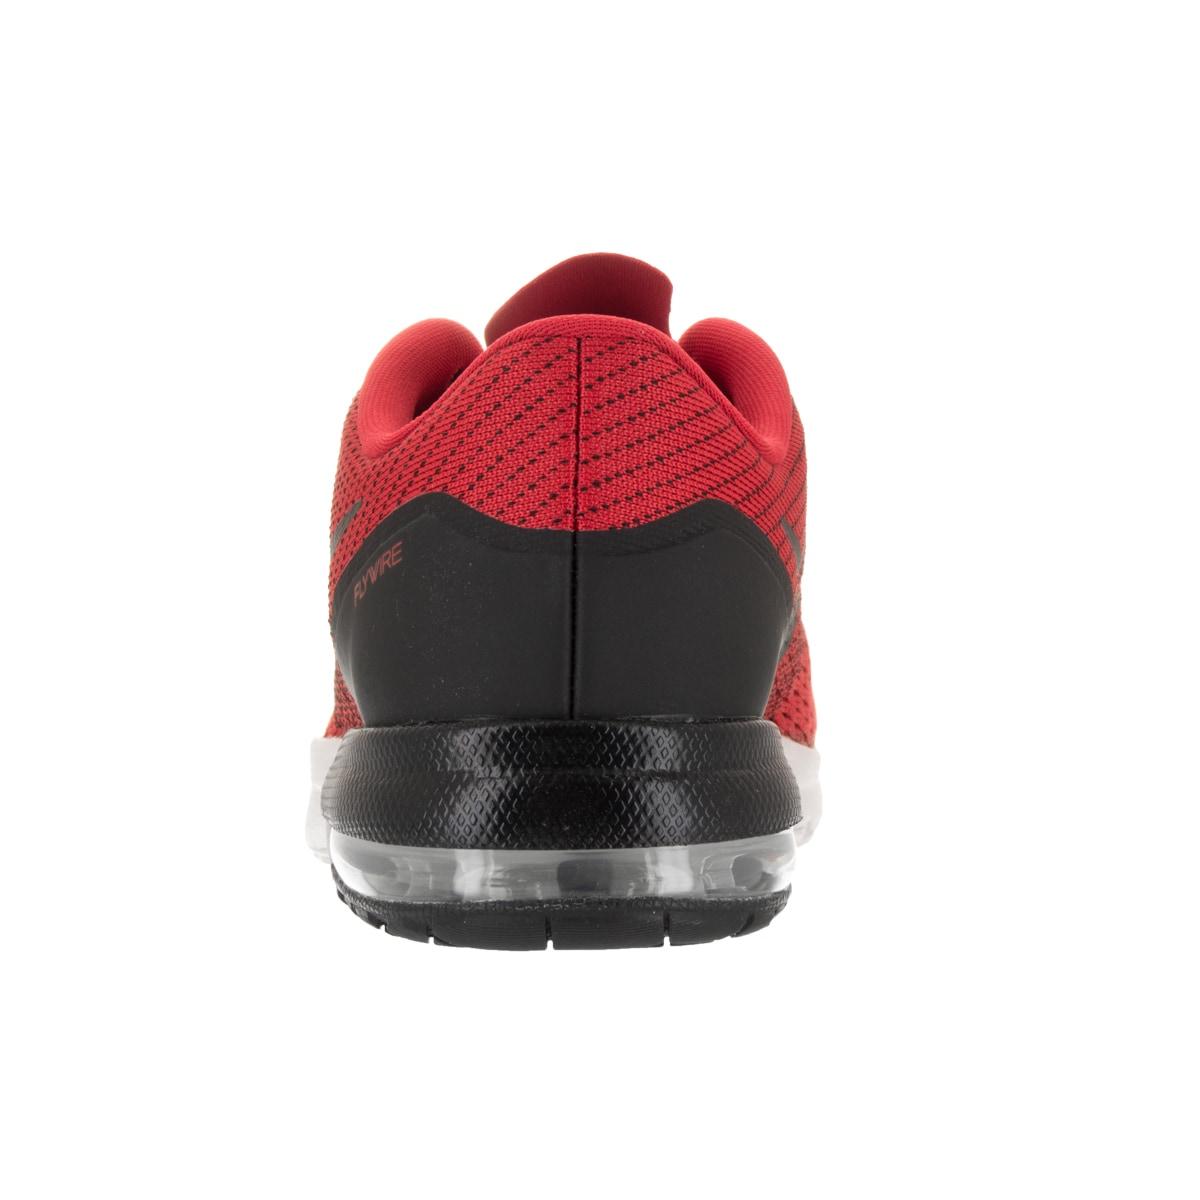 Nike Air Max Typha Mens Cross Training Shoes Red Black